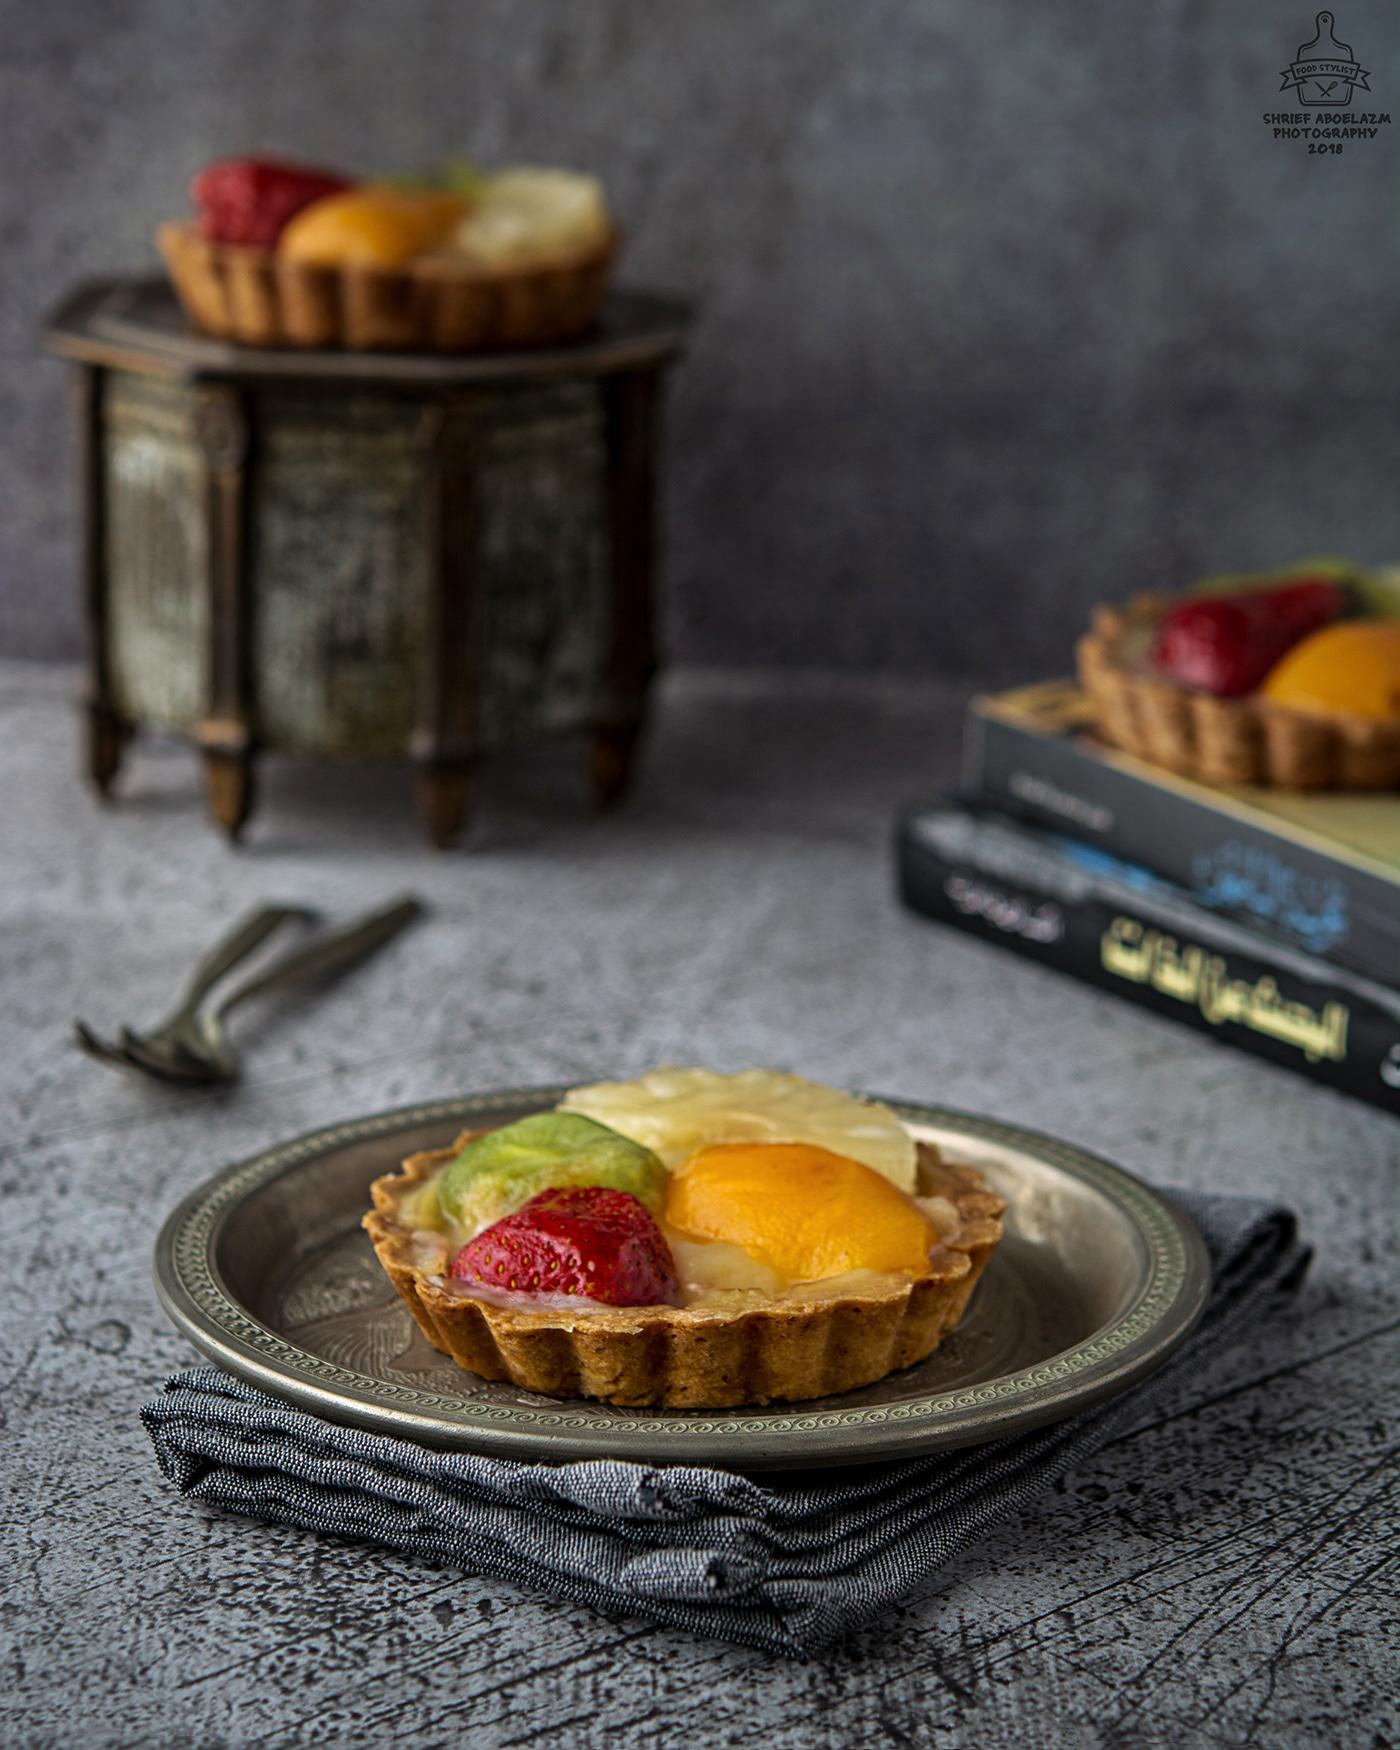 Десерты / Art director and food stylist Shrief Aboelazm